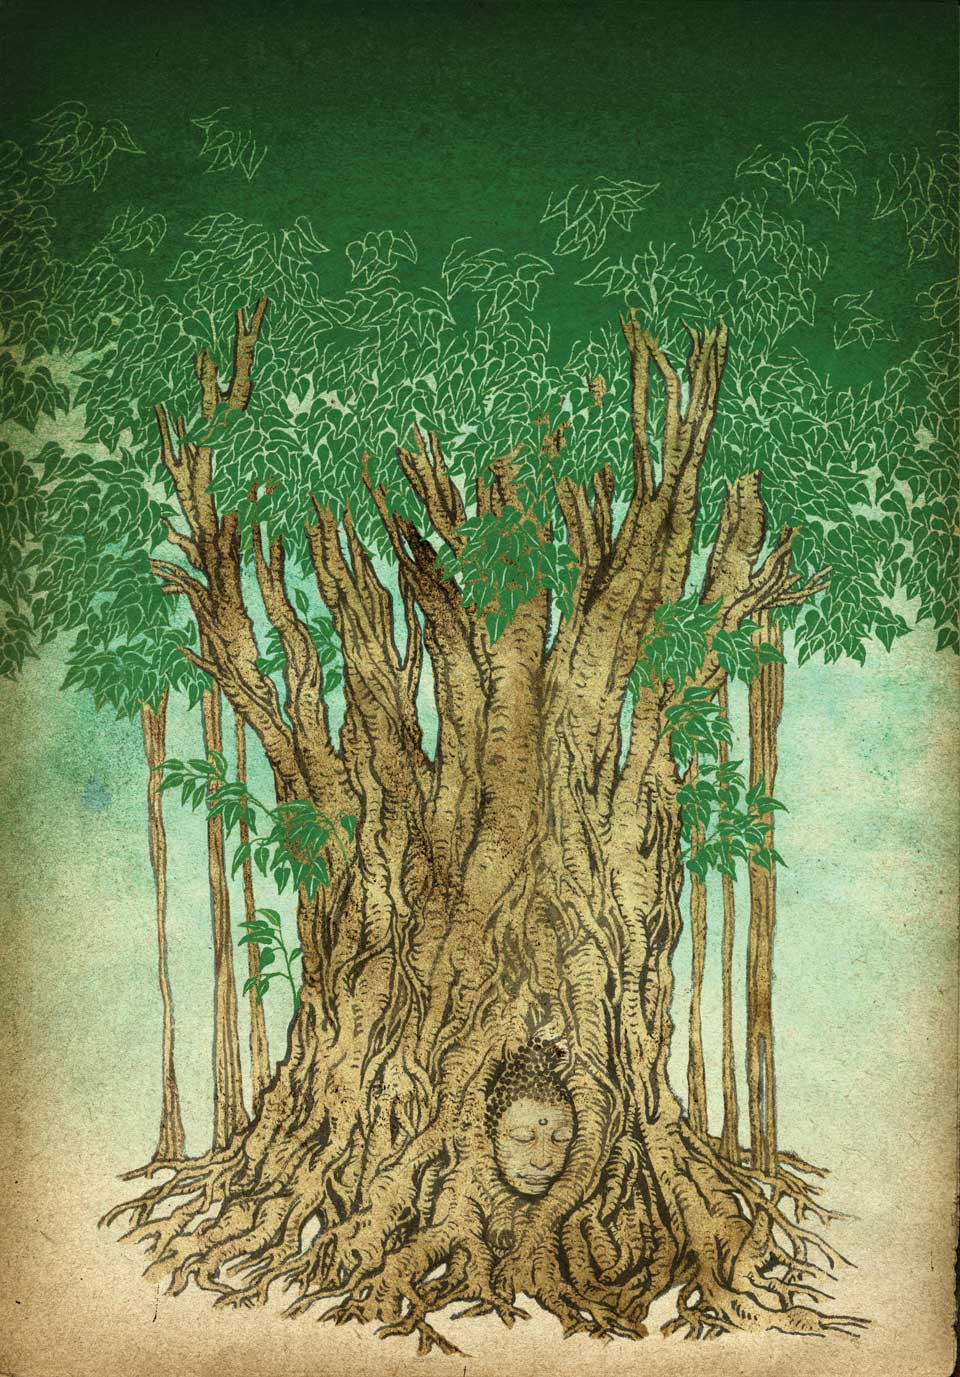 https://i2.wp.com/yukoart.com/wp-content/uploads/2016/11/harvard_divinity_cover_bodhai_tree.jpg